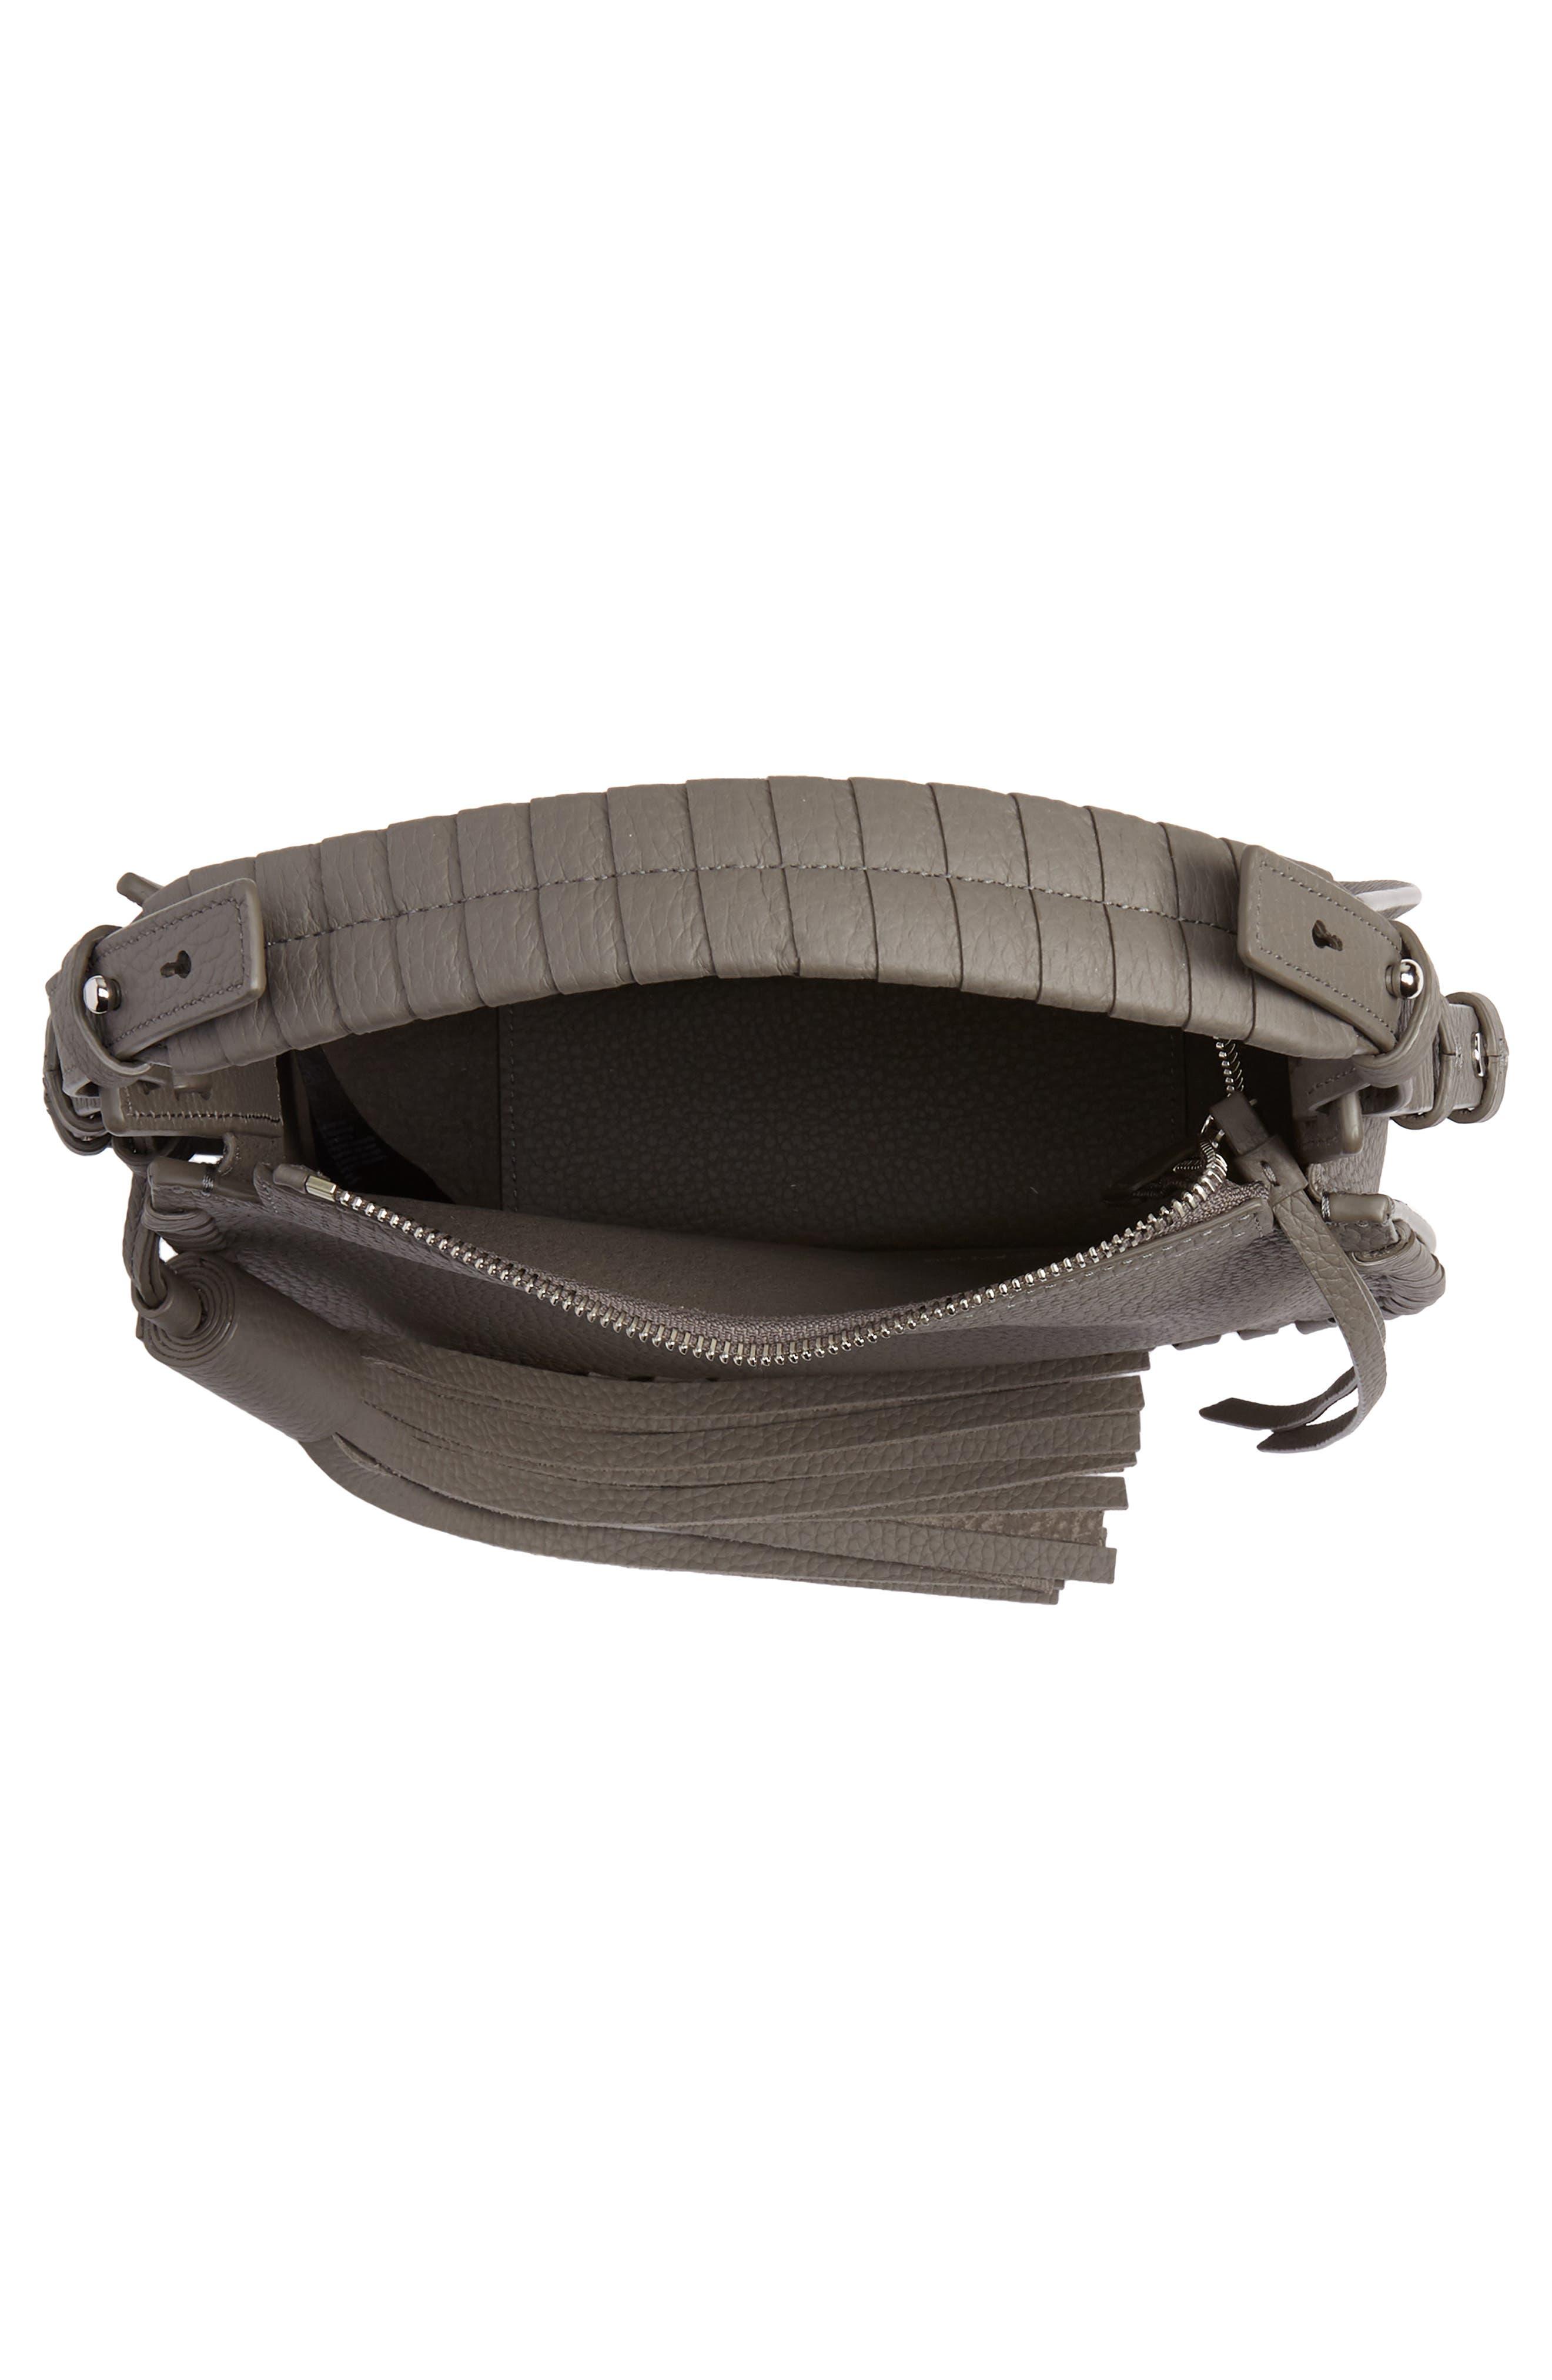 ALLSAINTS, Mori Leather Crossbody Bag, Alternate thumbnail 4, color, STORM GREY